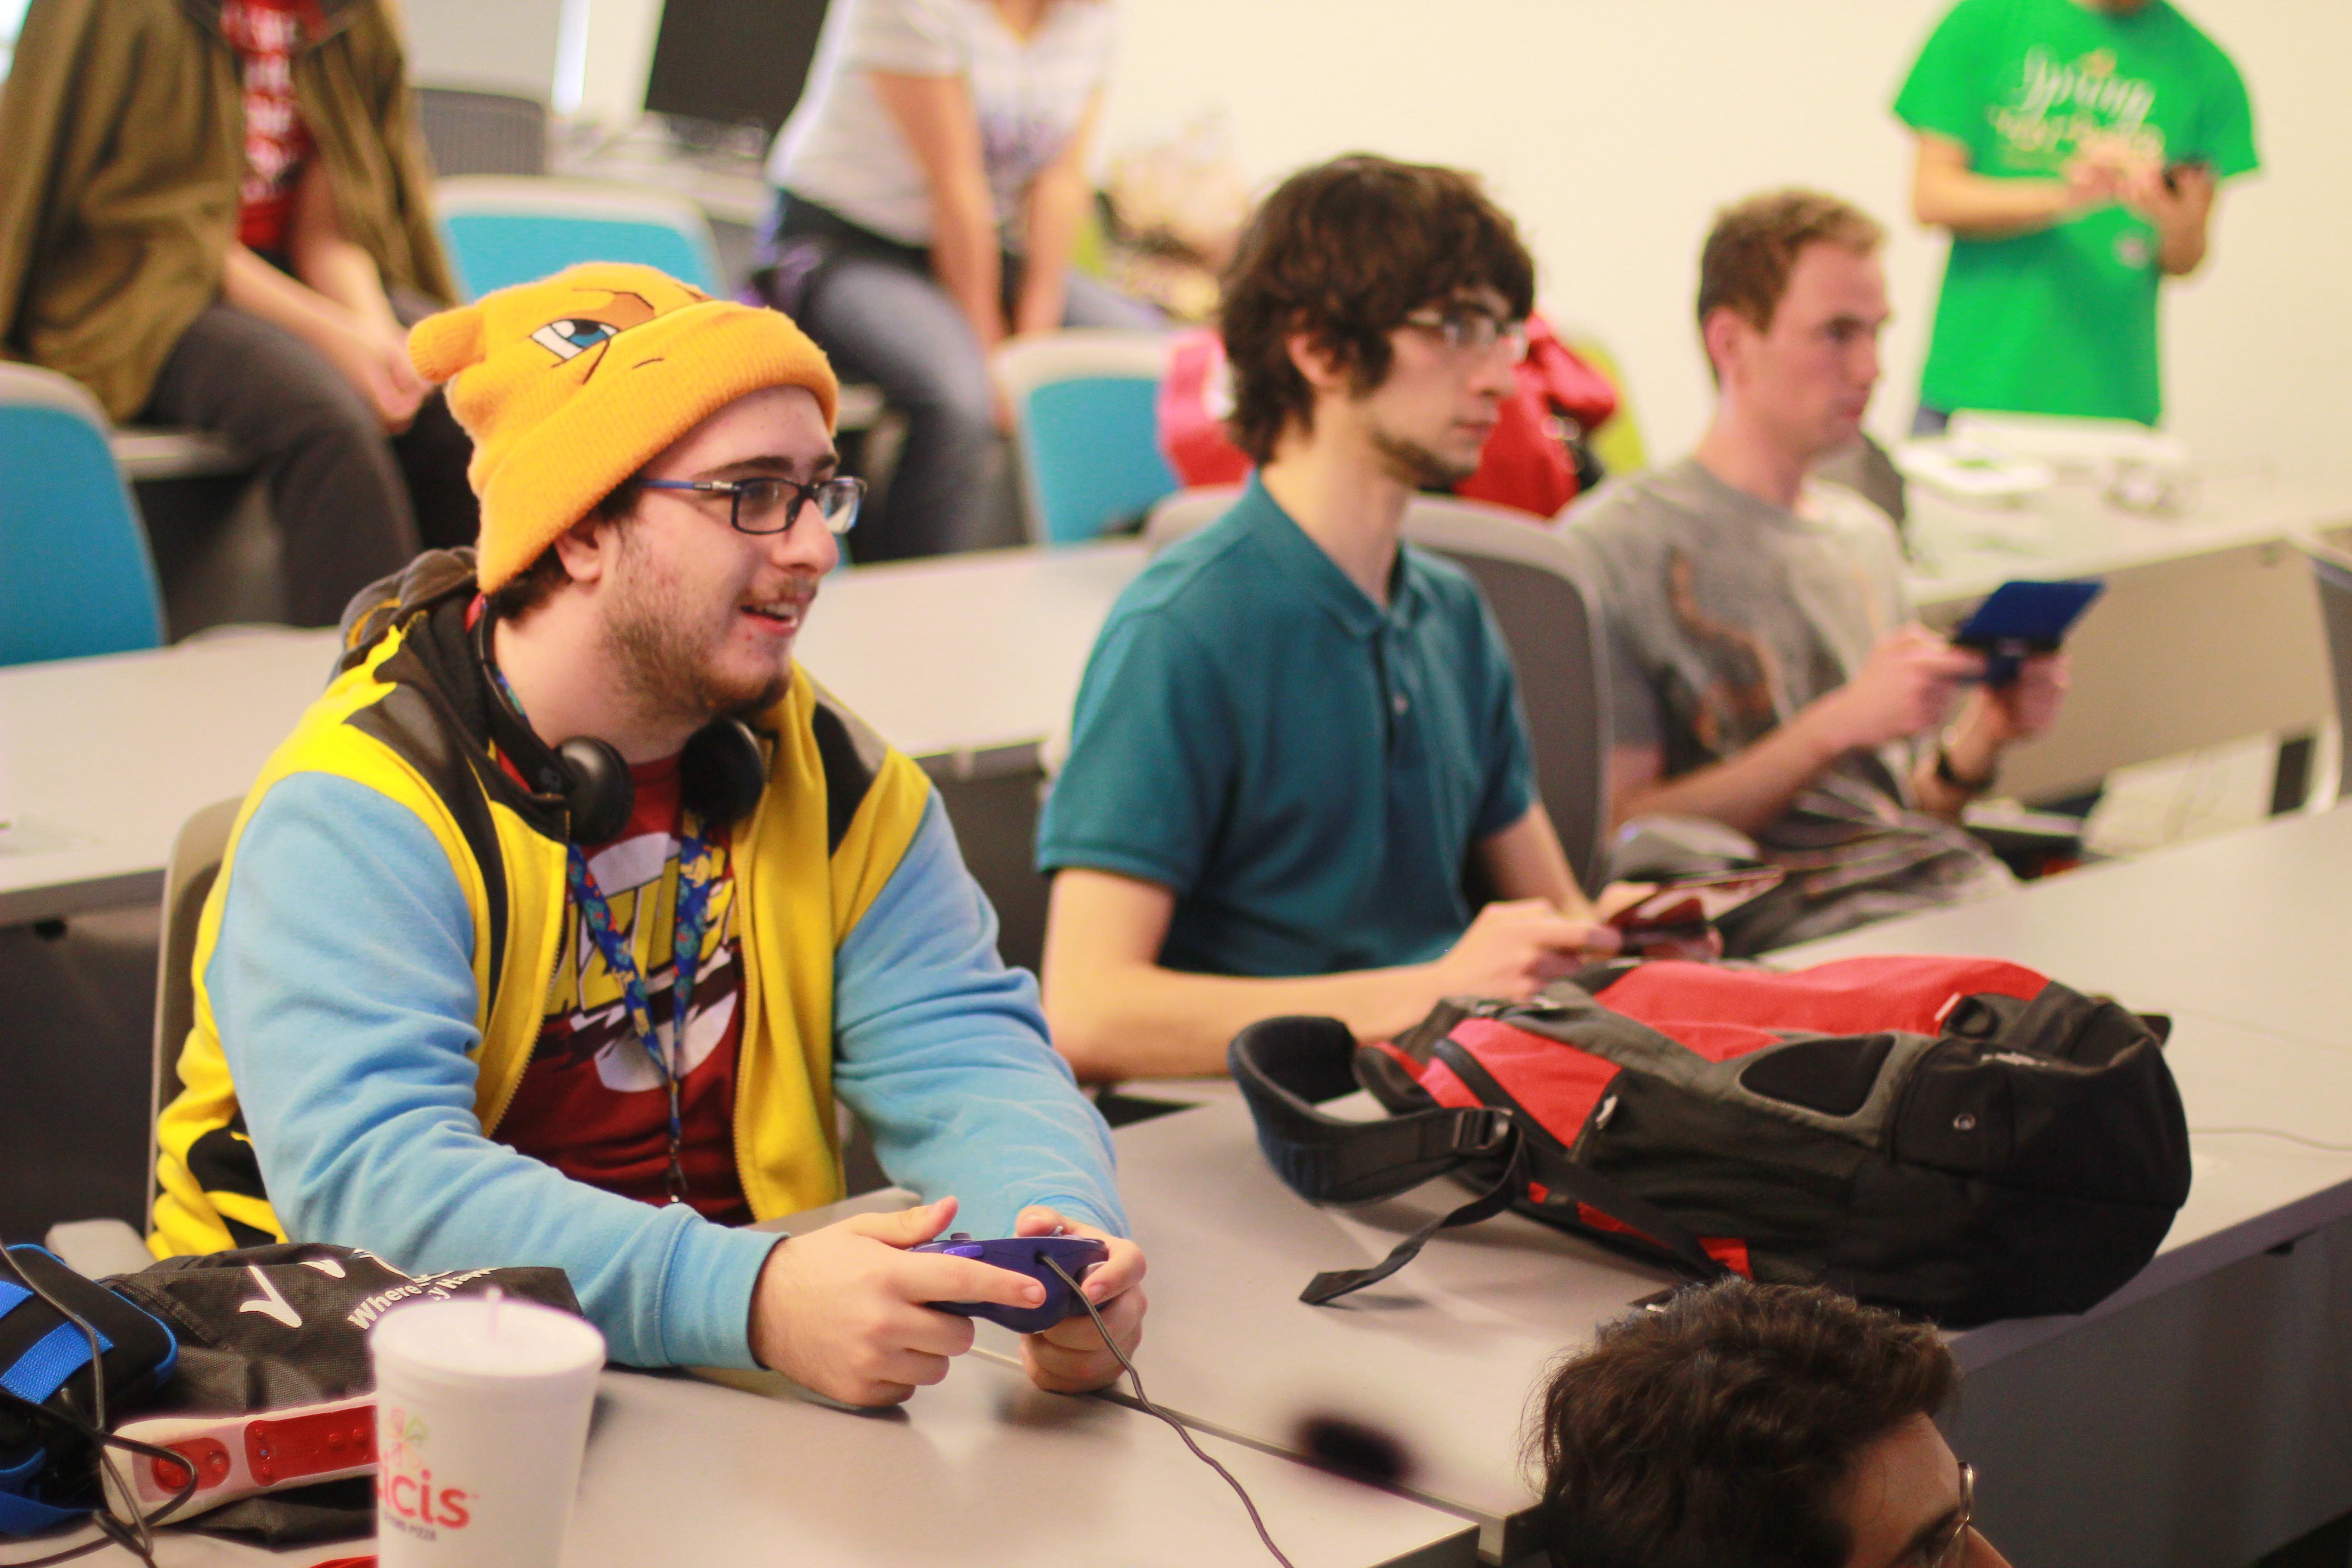 Pokemon League diversifies group events, activities